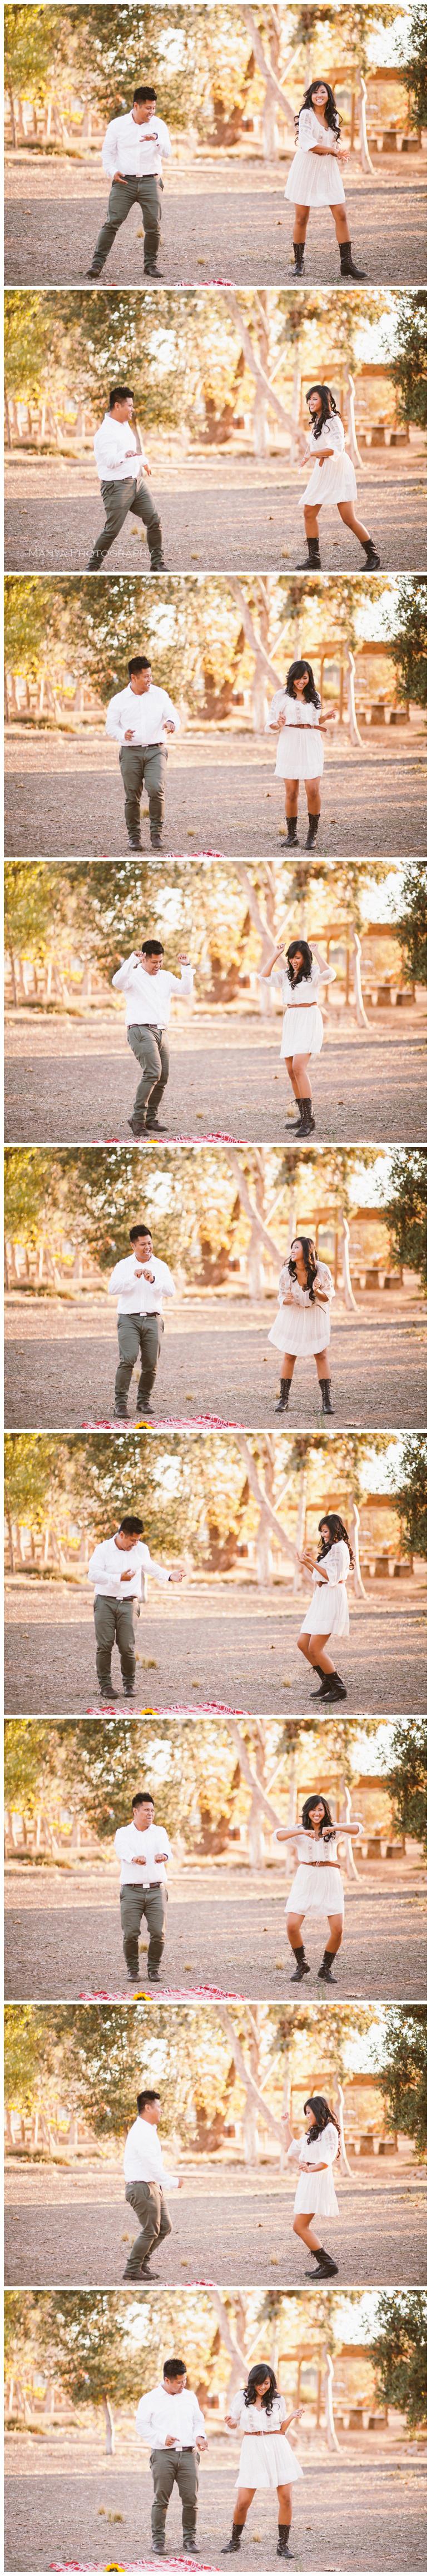 2015-02-01_0026- Tommy and Nancy | Engagement | San Juan Capistrano, CA | Southern California Wedding Photographer | Manya Photography